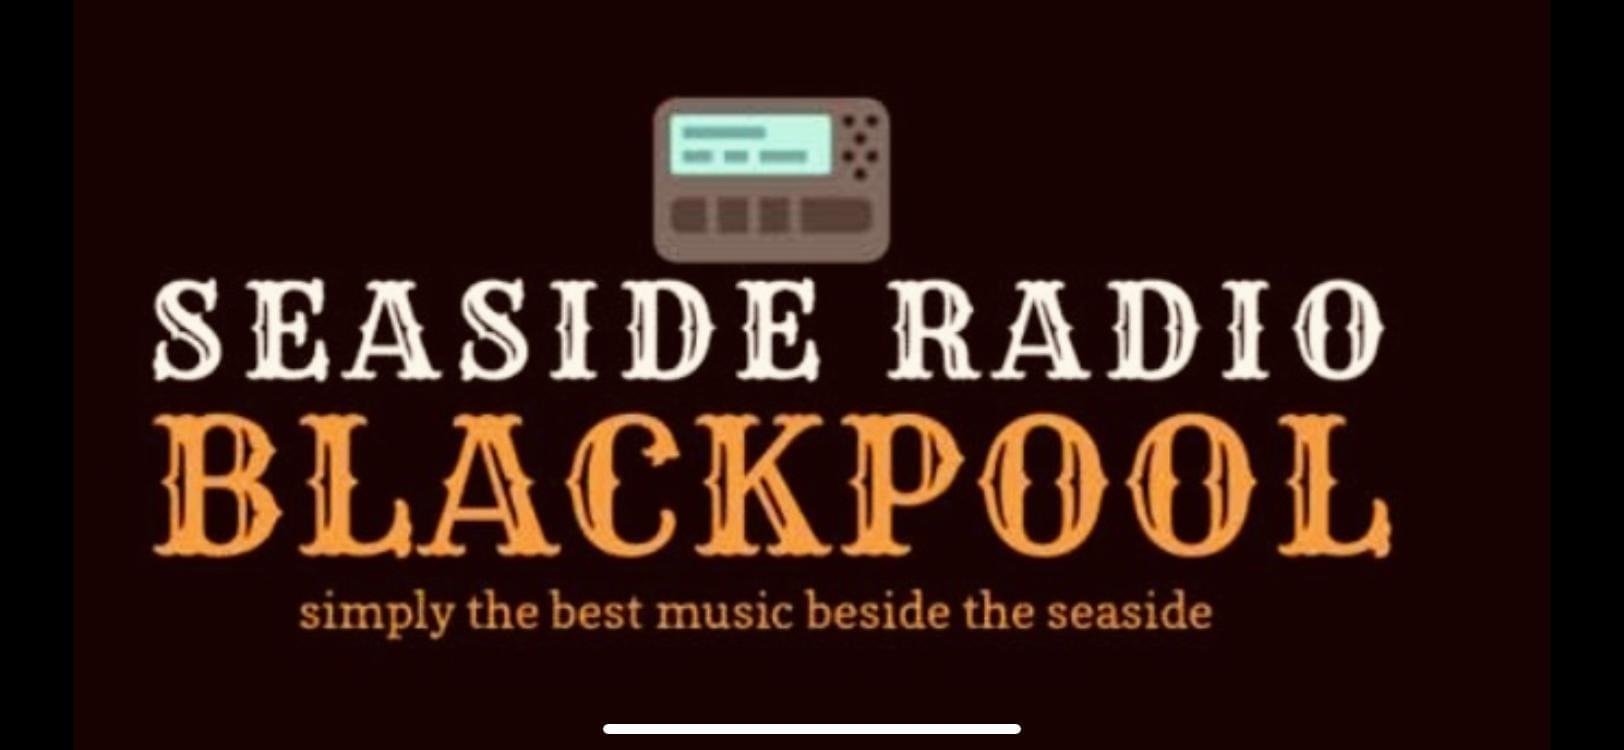 Gay radio blackpool